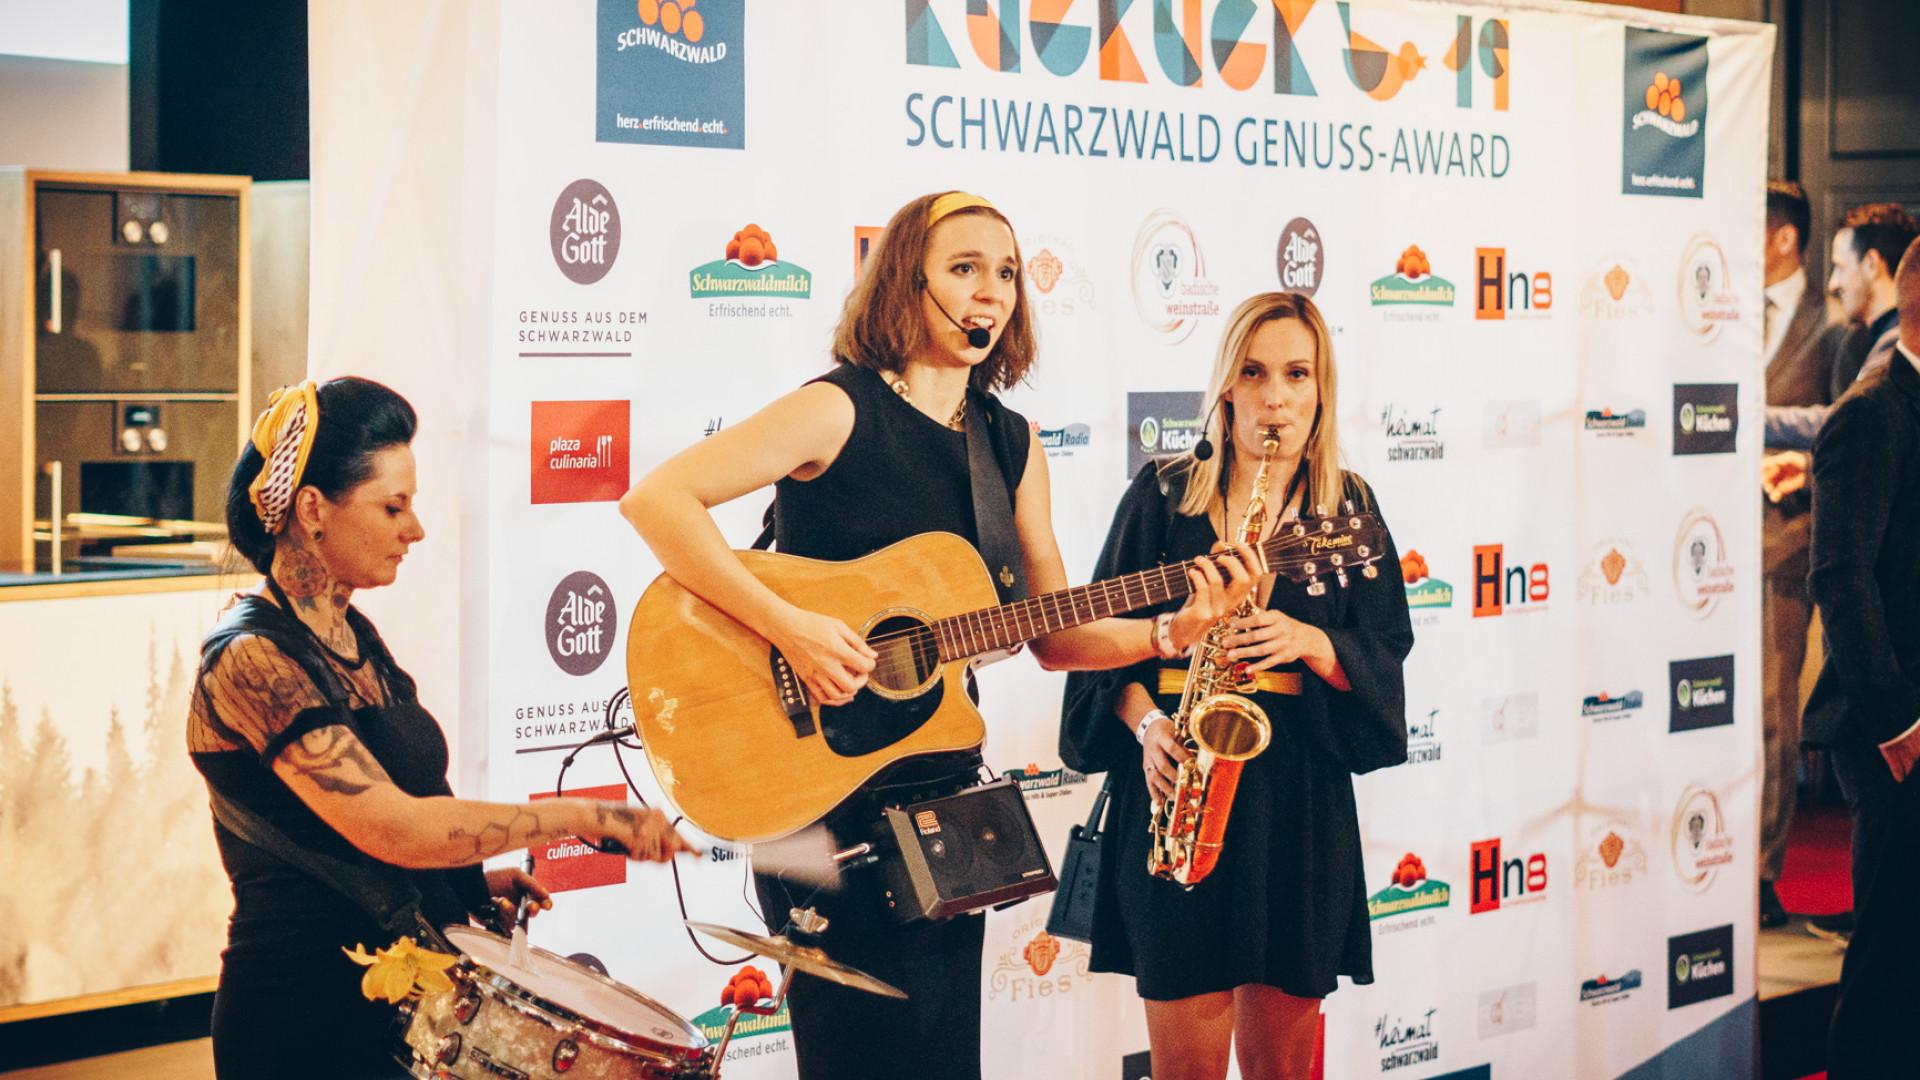 Kuckuck 20 Schwarzwald Genuss Award